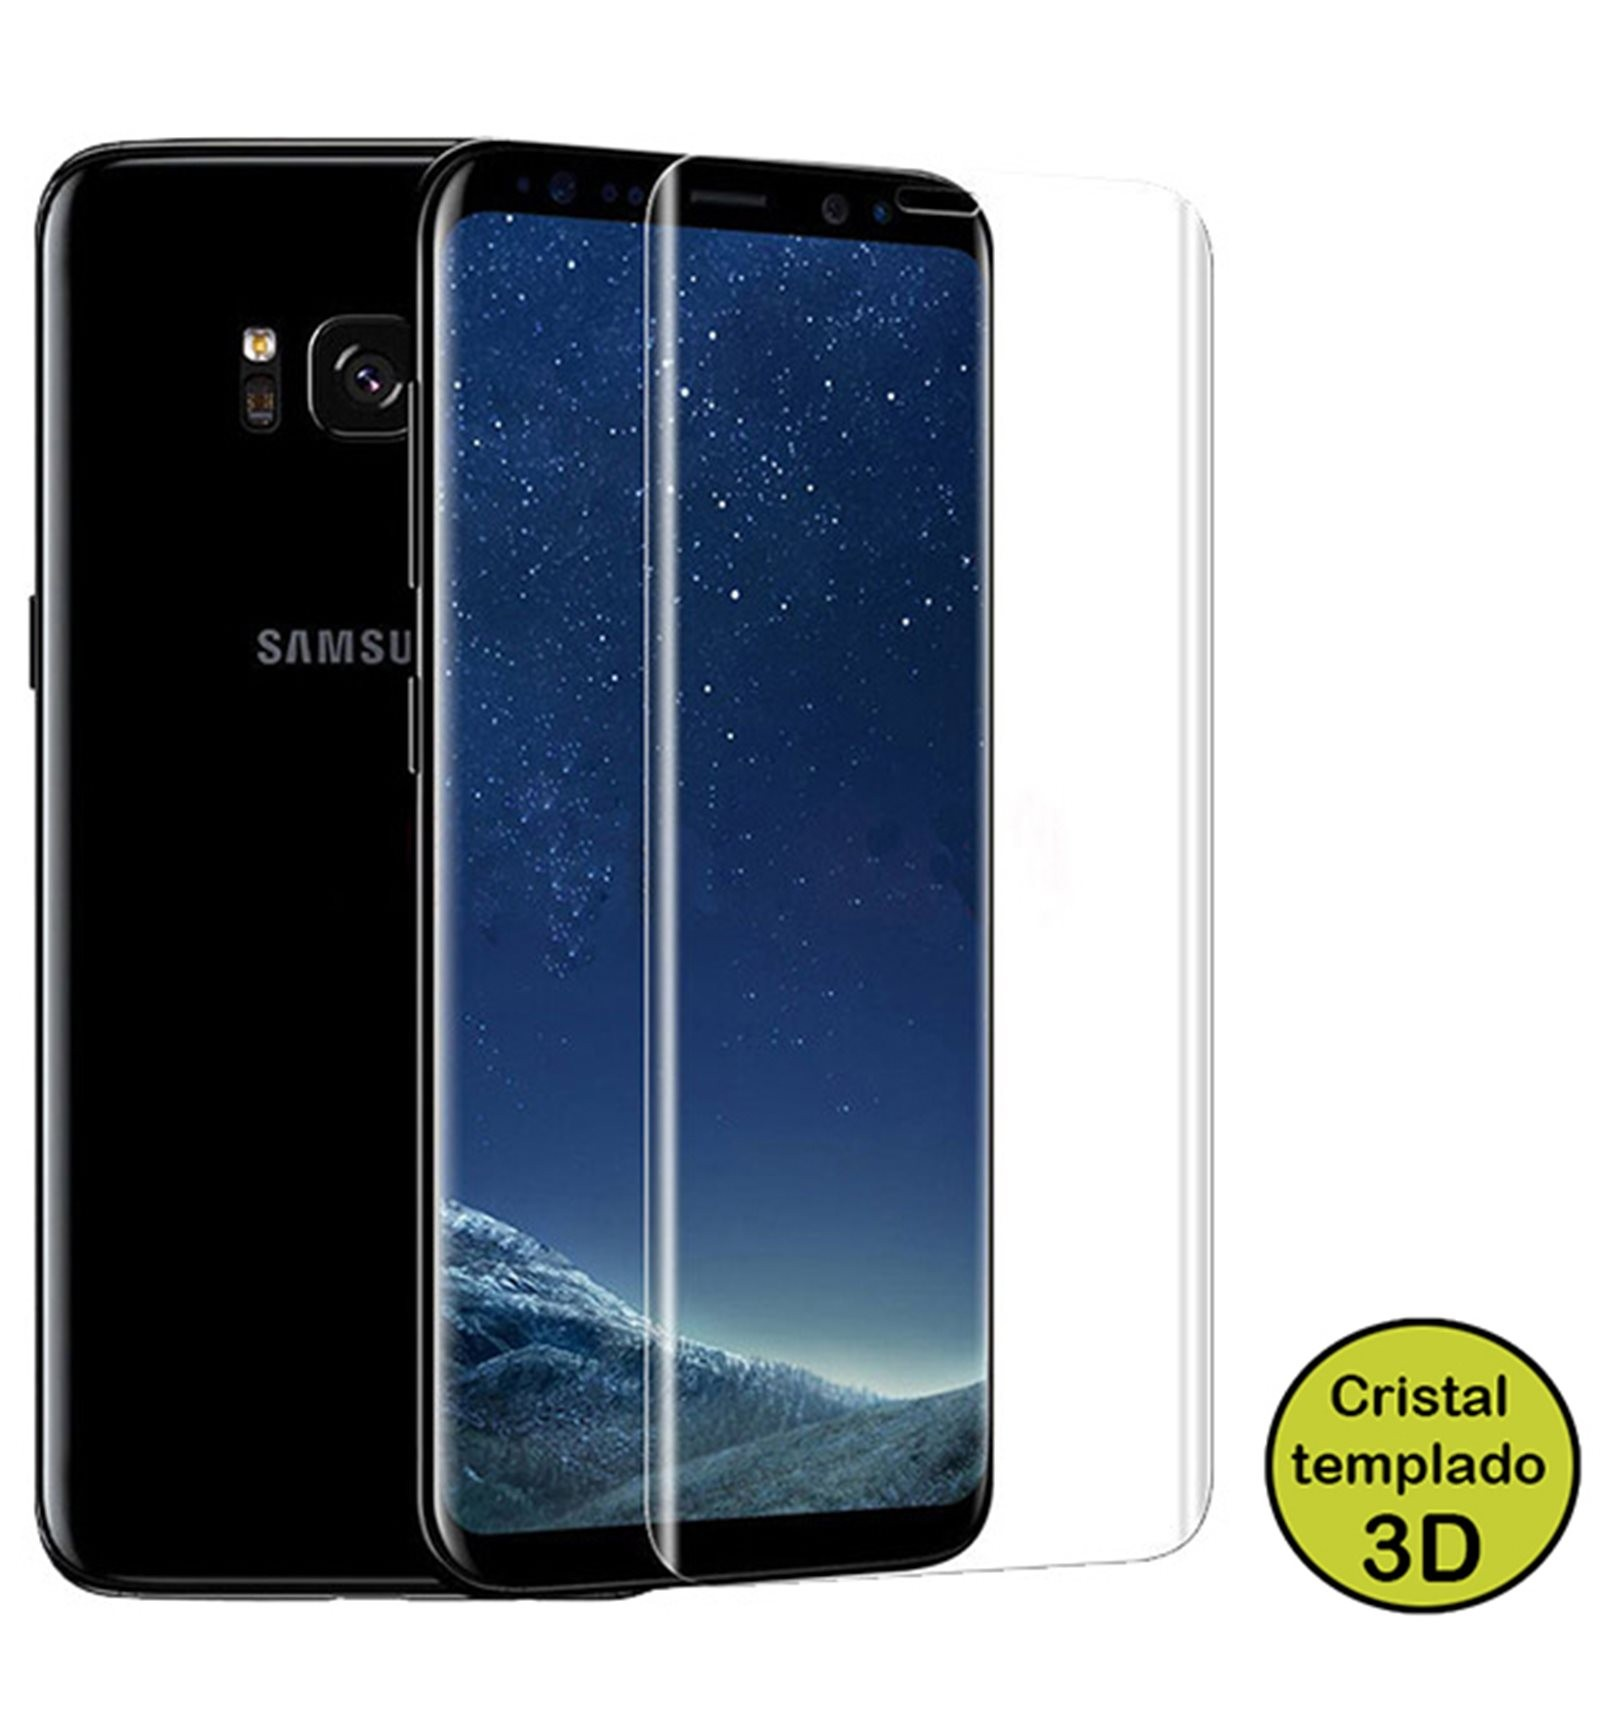 samsung-galaxy-s8-plus-cristal-templado-3d-transparente